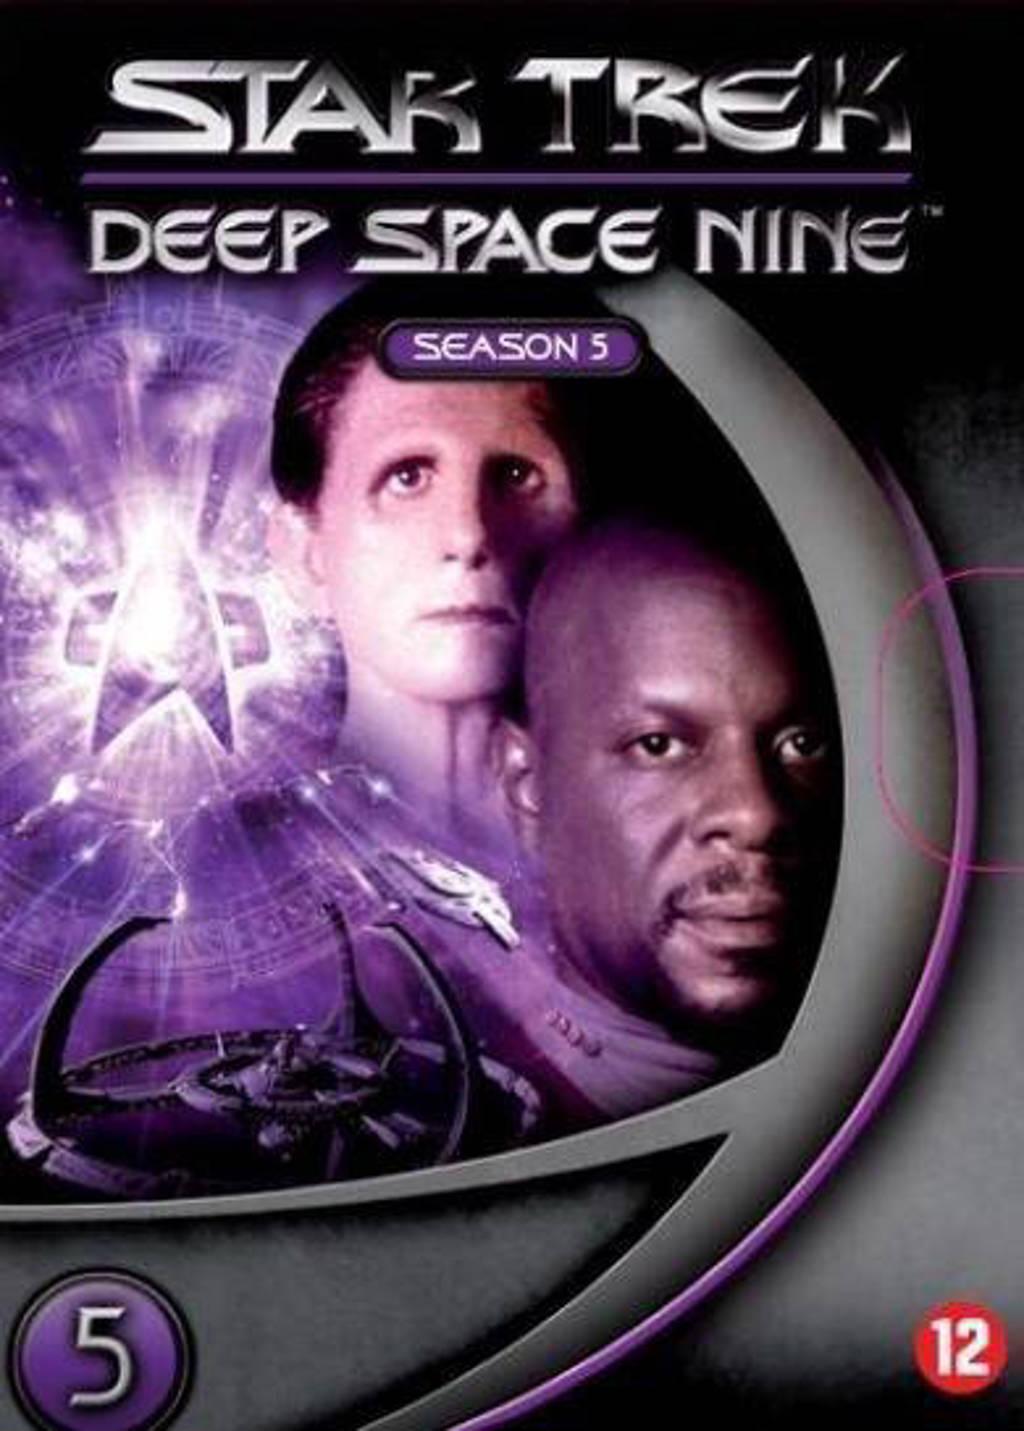 Star trek deep space nine - Seizoen 5 (DVD)